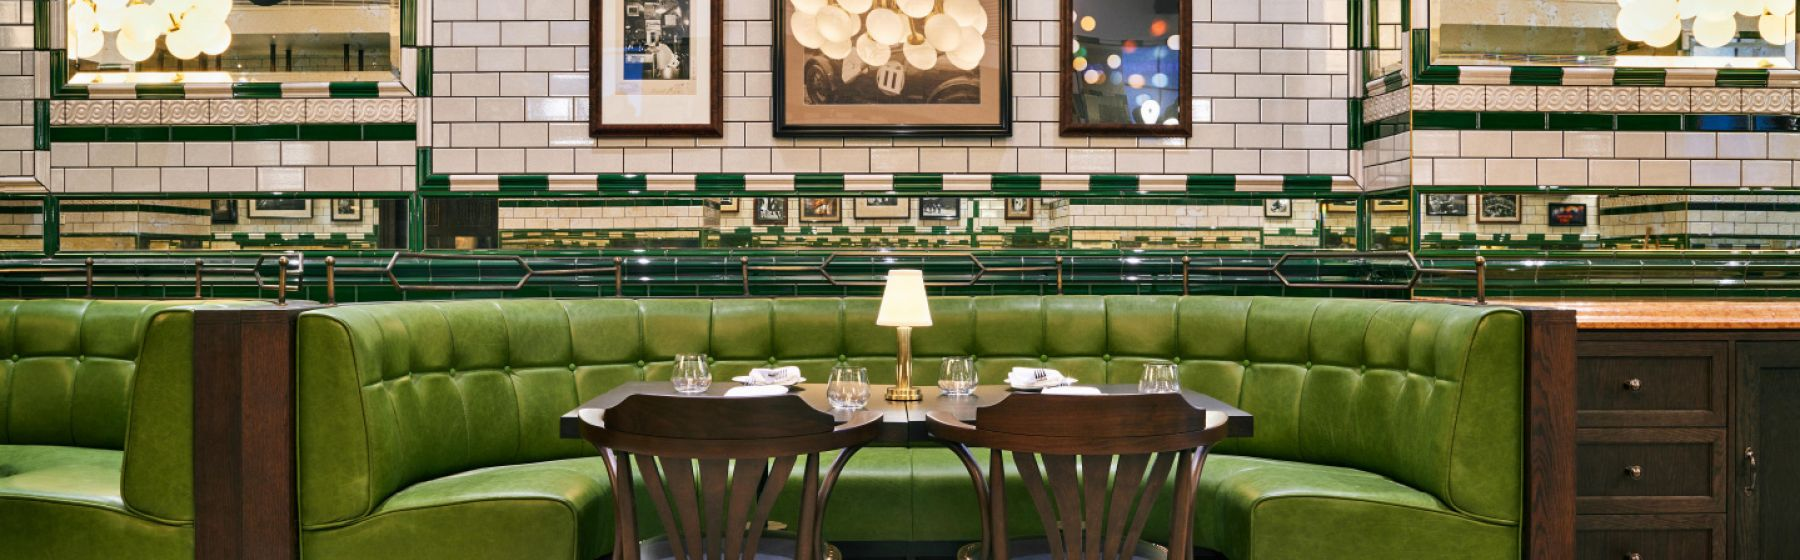 Isaac's Restaurant Interior